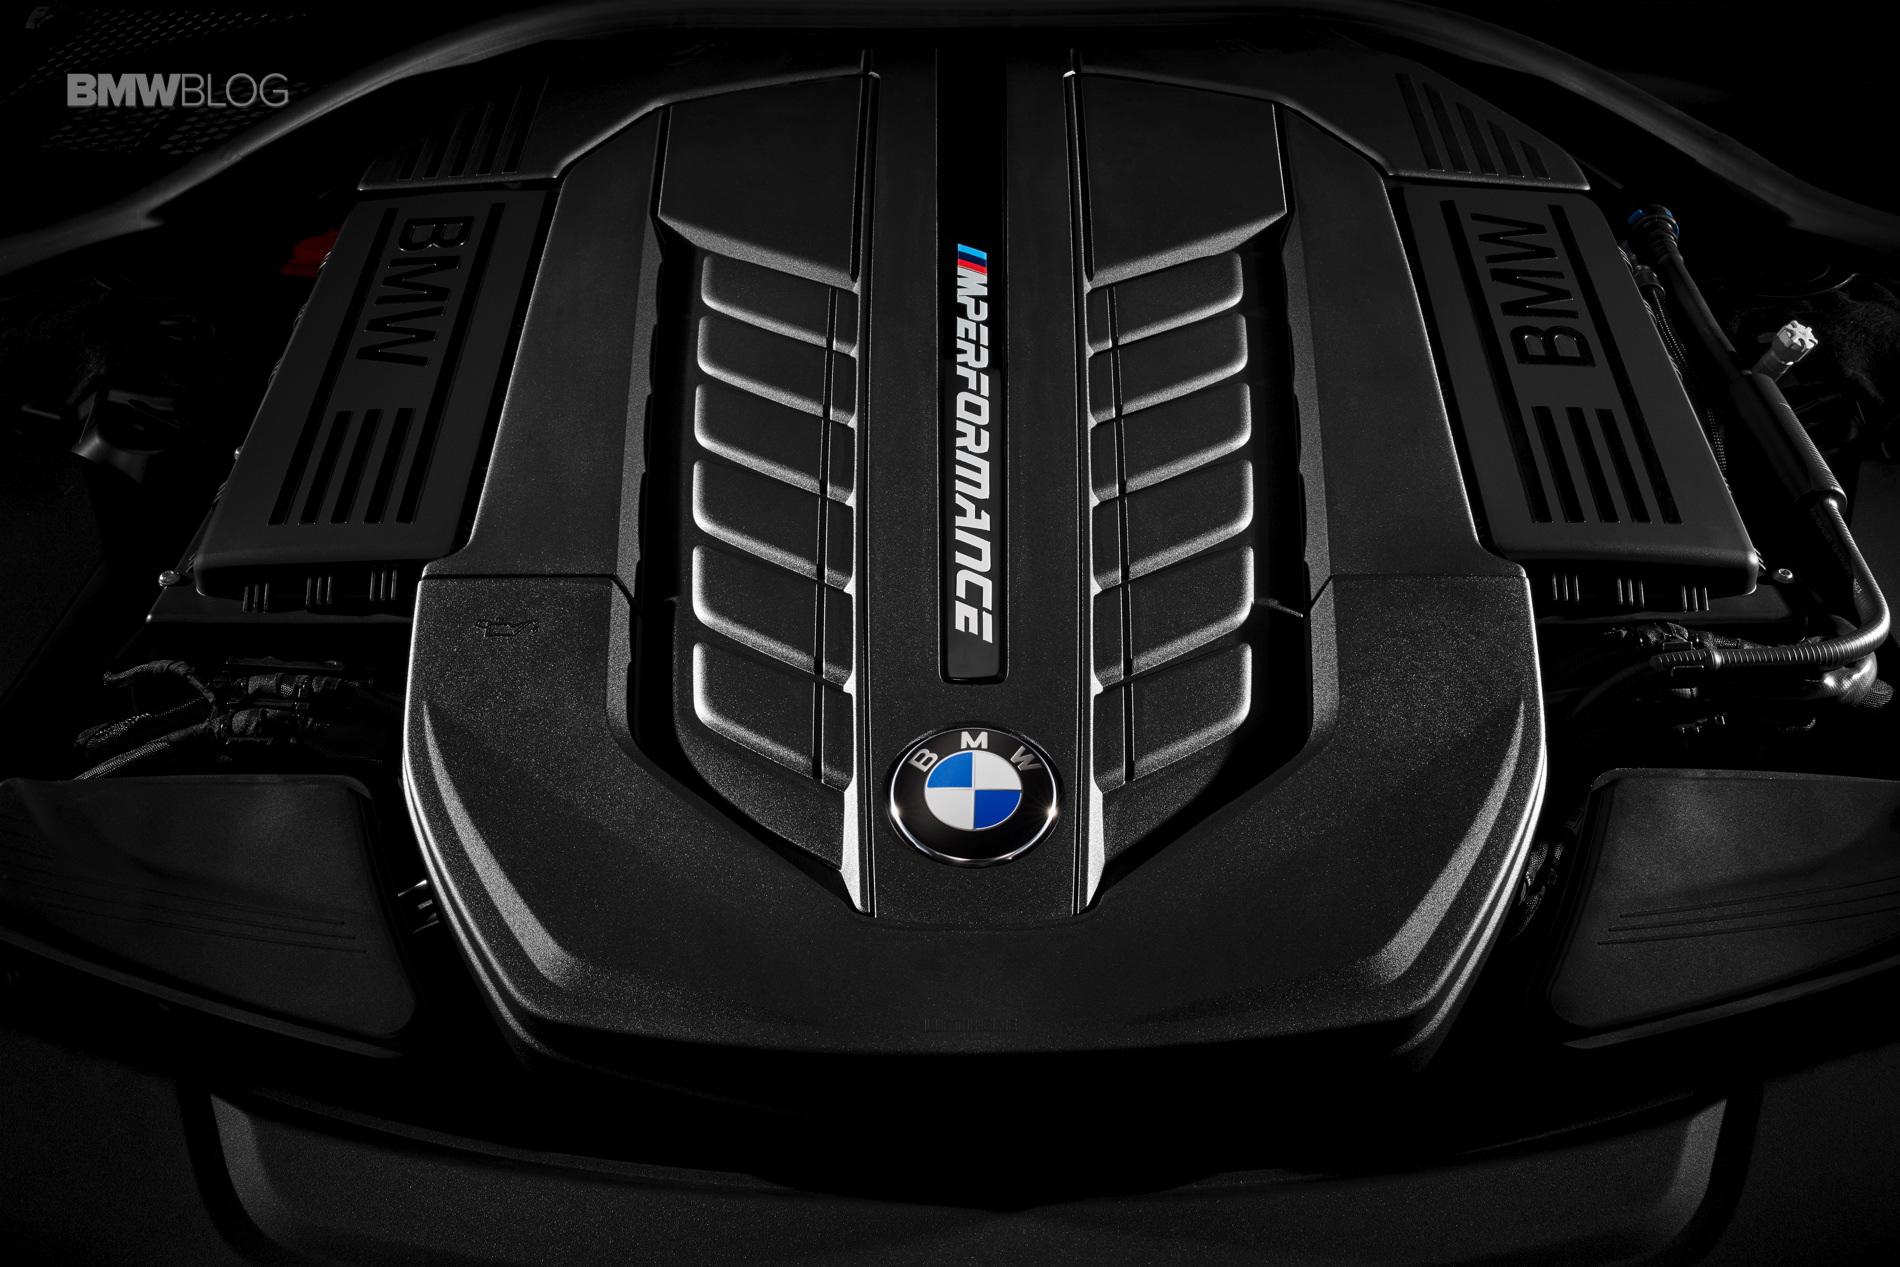 Корпорация БМВ покажет на автосалоне новую версию седана 7-Series 2